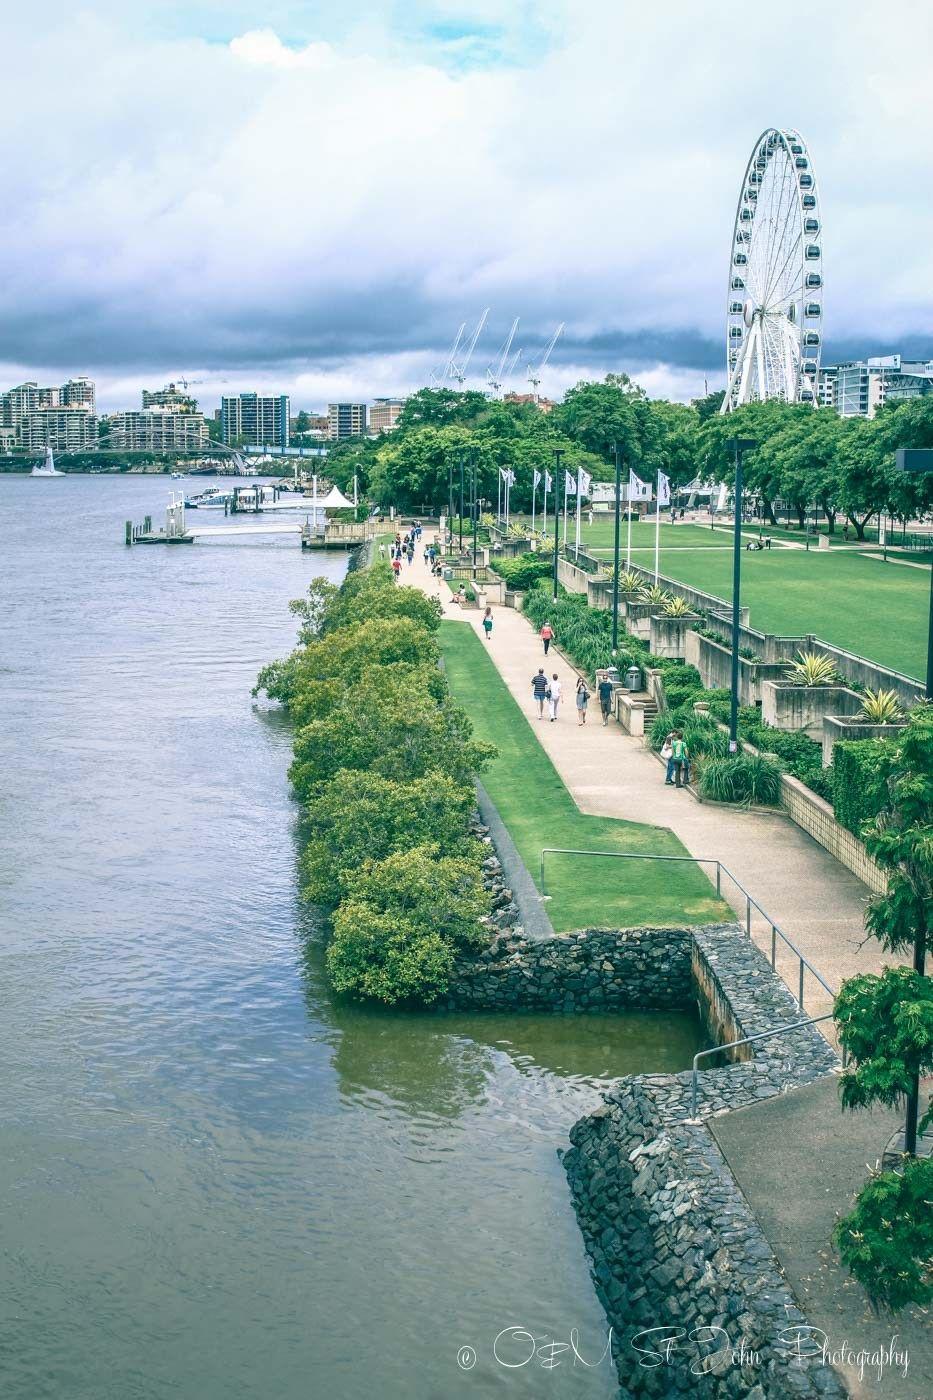 Landscapes along the south bank - Clem Jones Promenade Runs Along The River In South Bank Brisbane